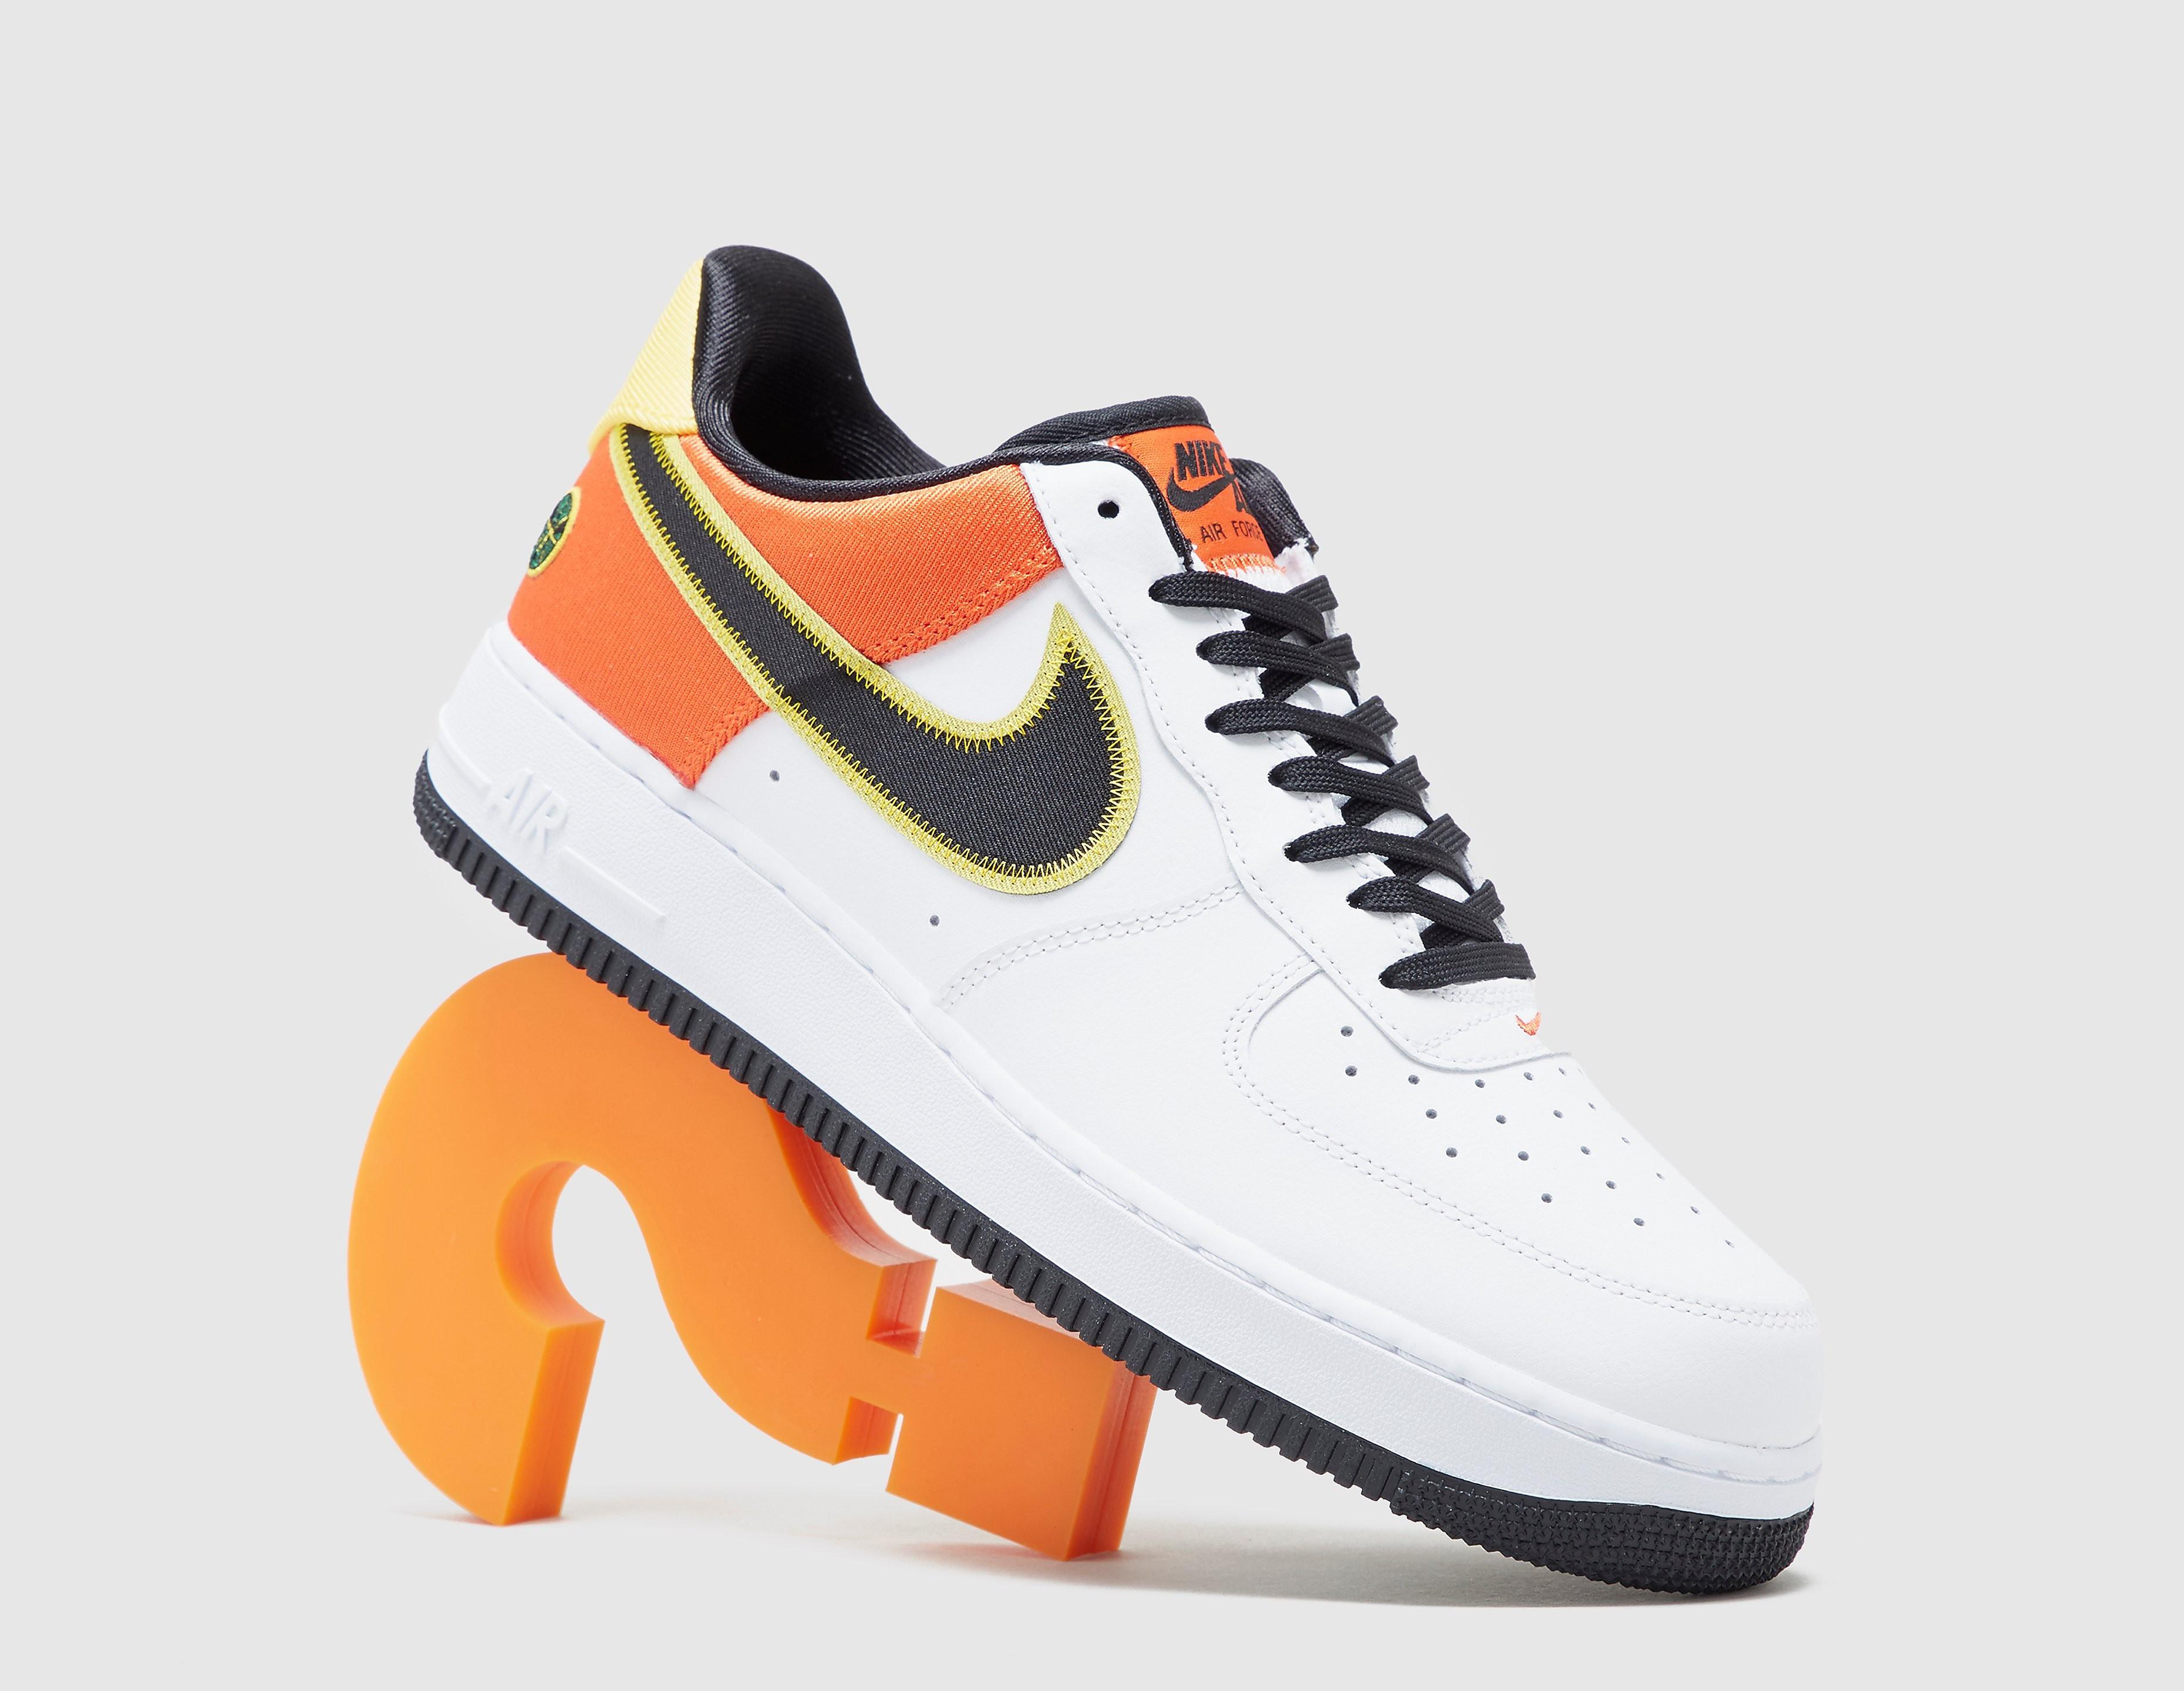 Nike Air Force 1 '07 LV8 'Raygun'